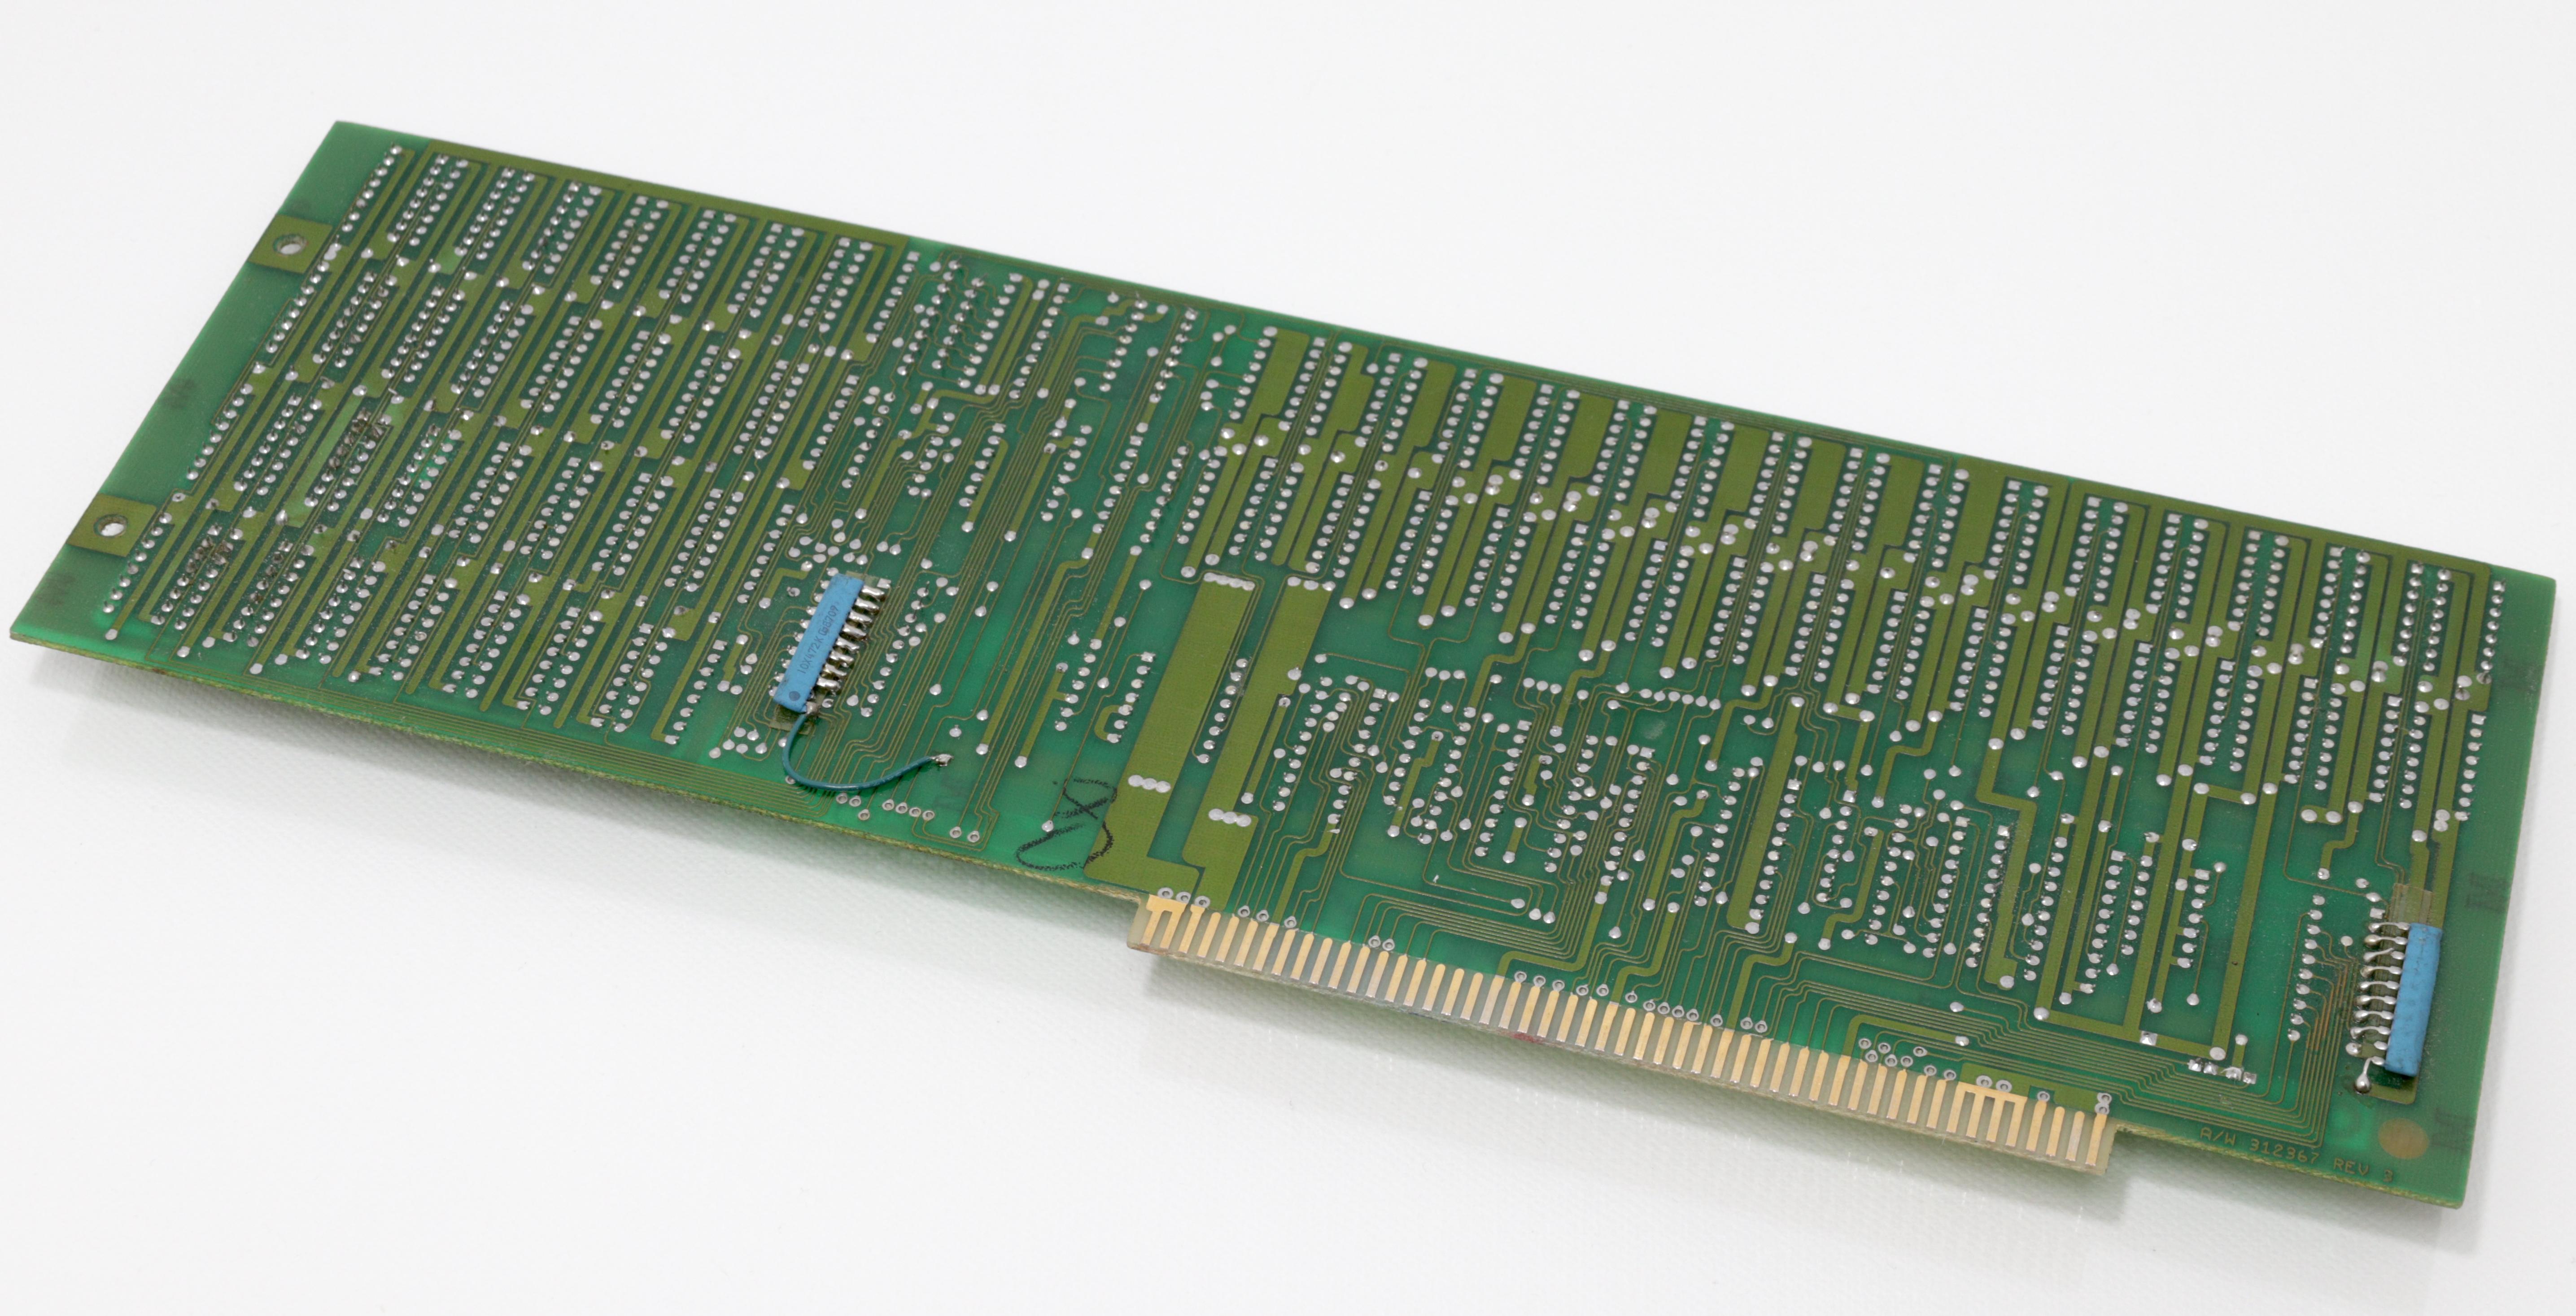 Commodore A25000 - 2MB Fast RAM bővítő hátoldal